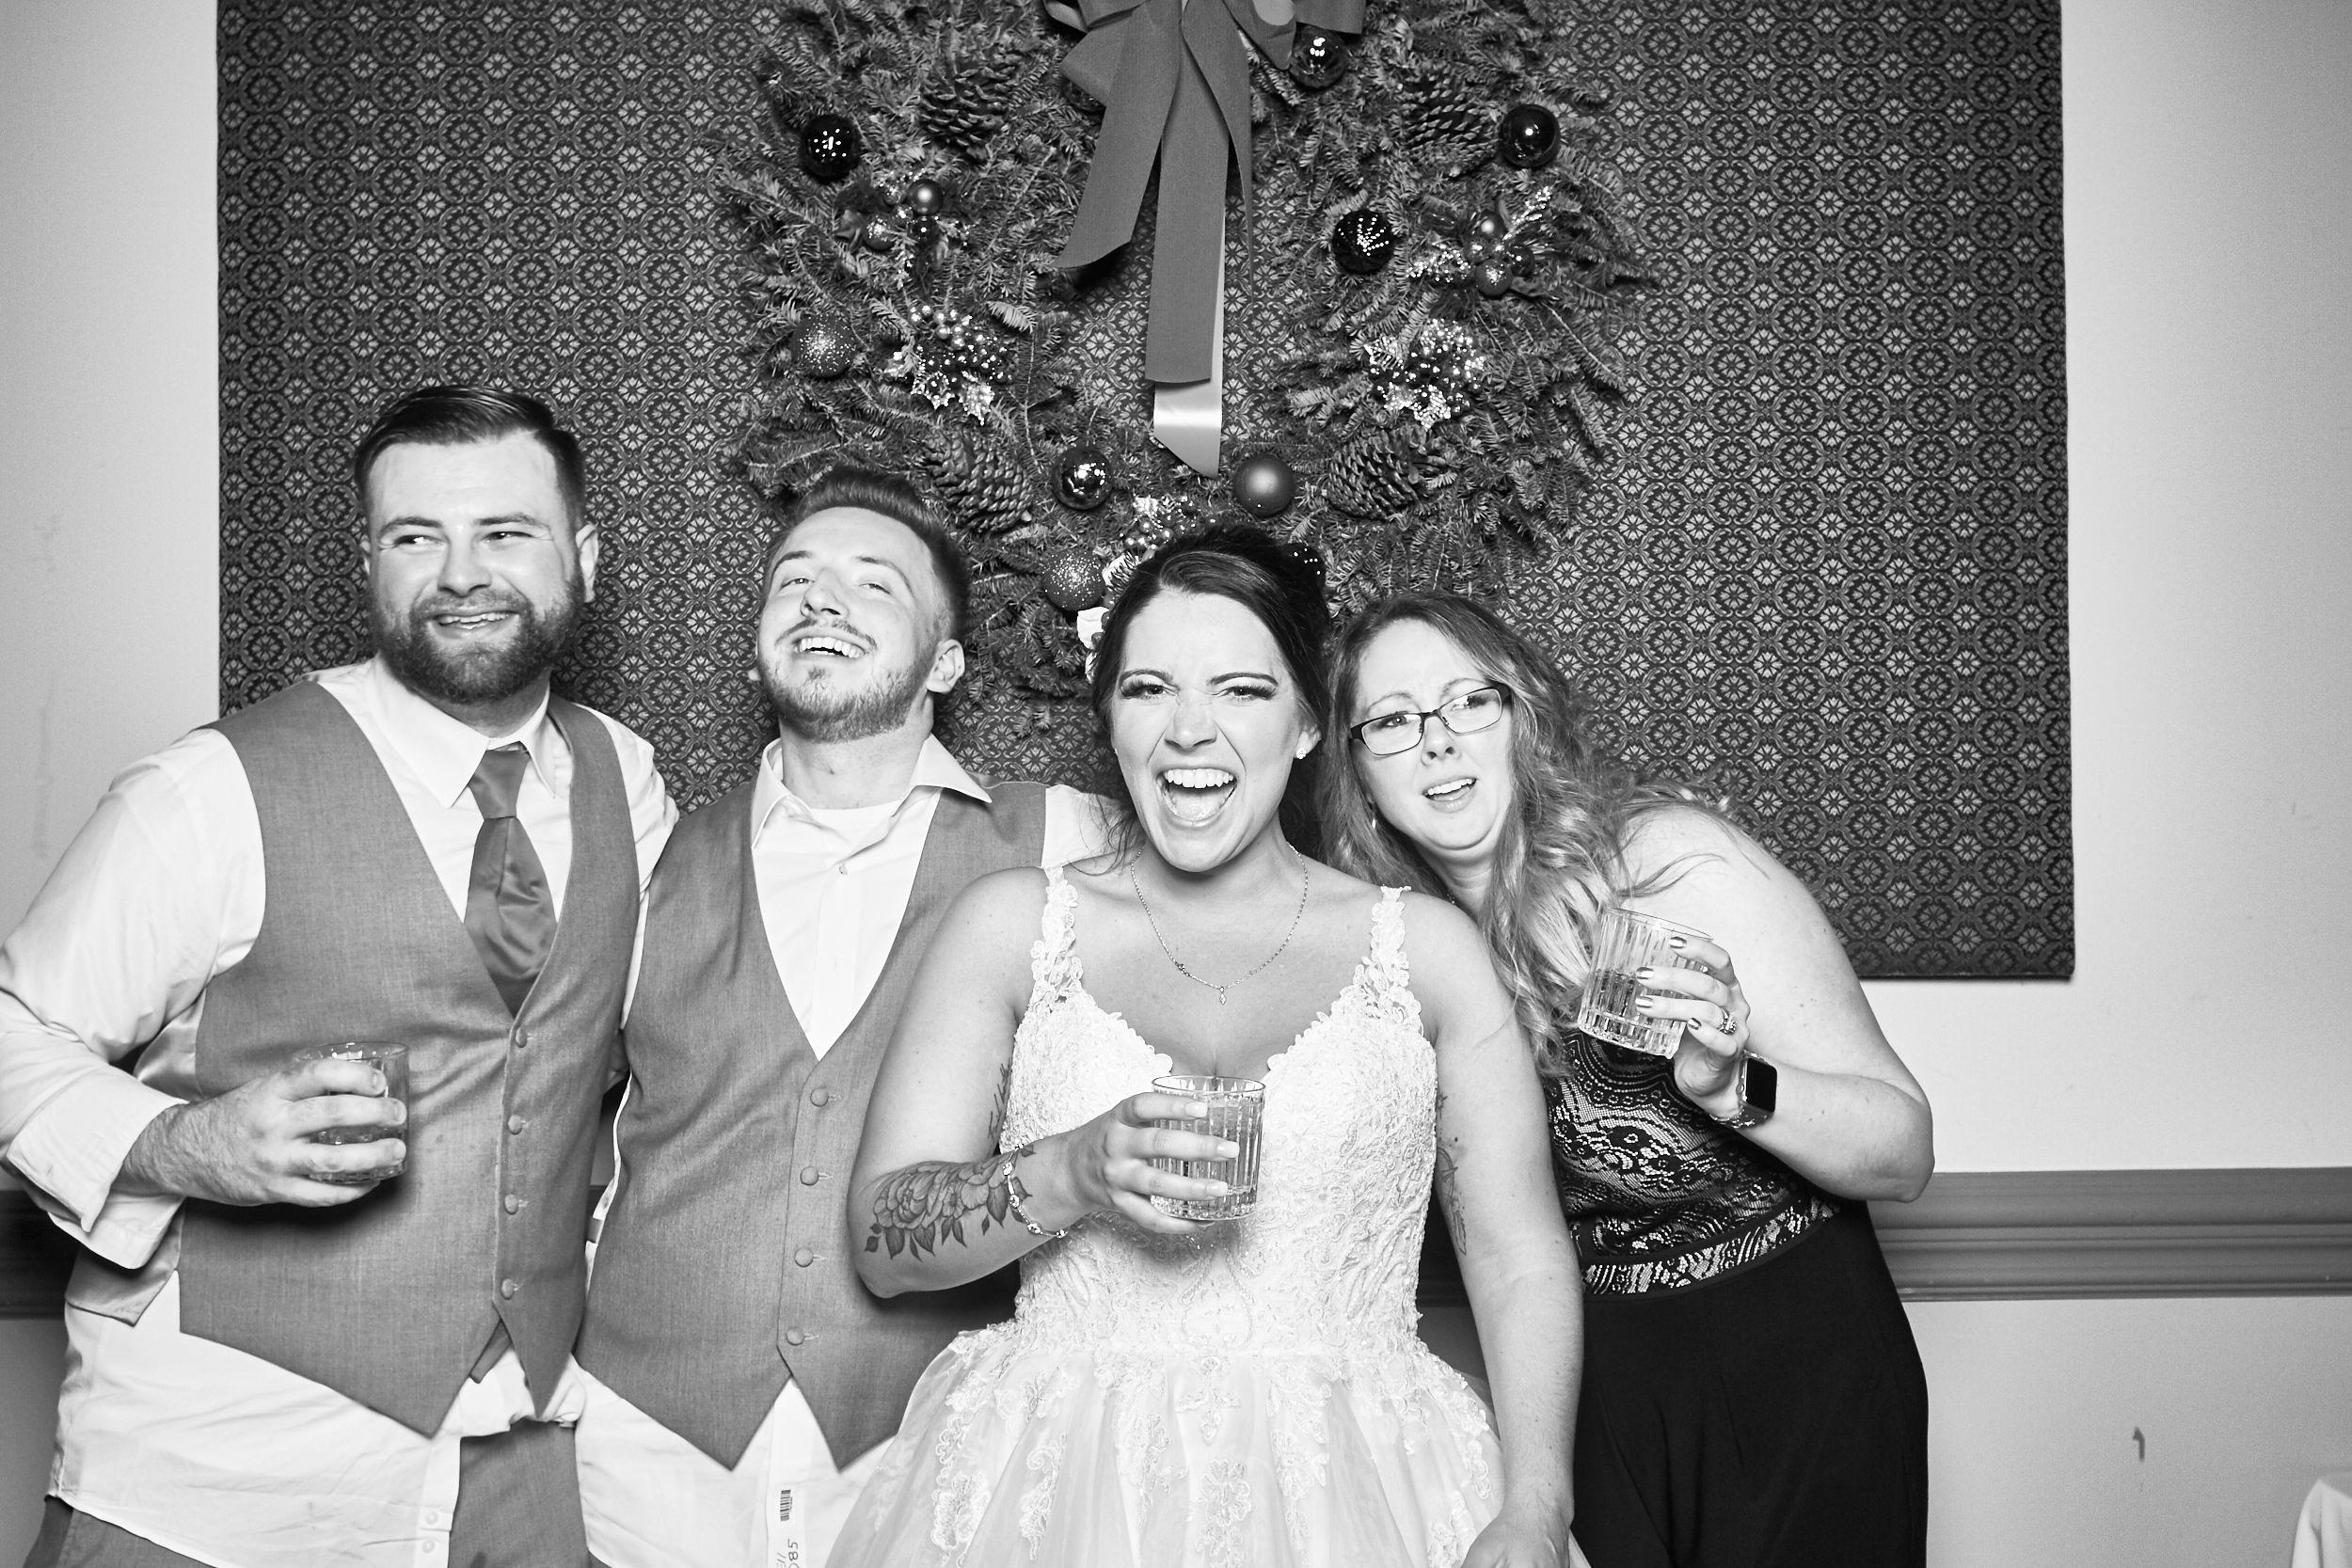 Alexa-James-Wedding-Photo-Booth984.jpg